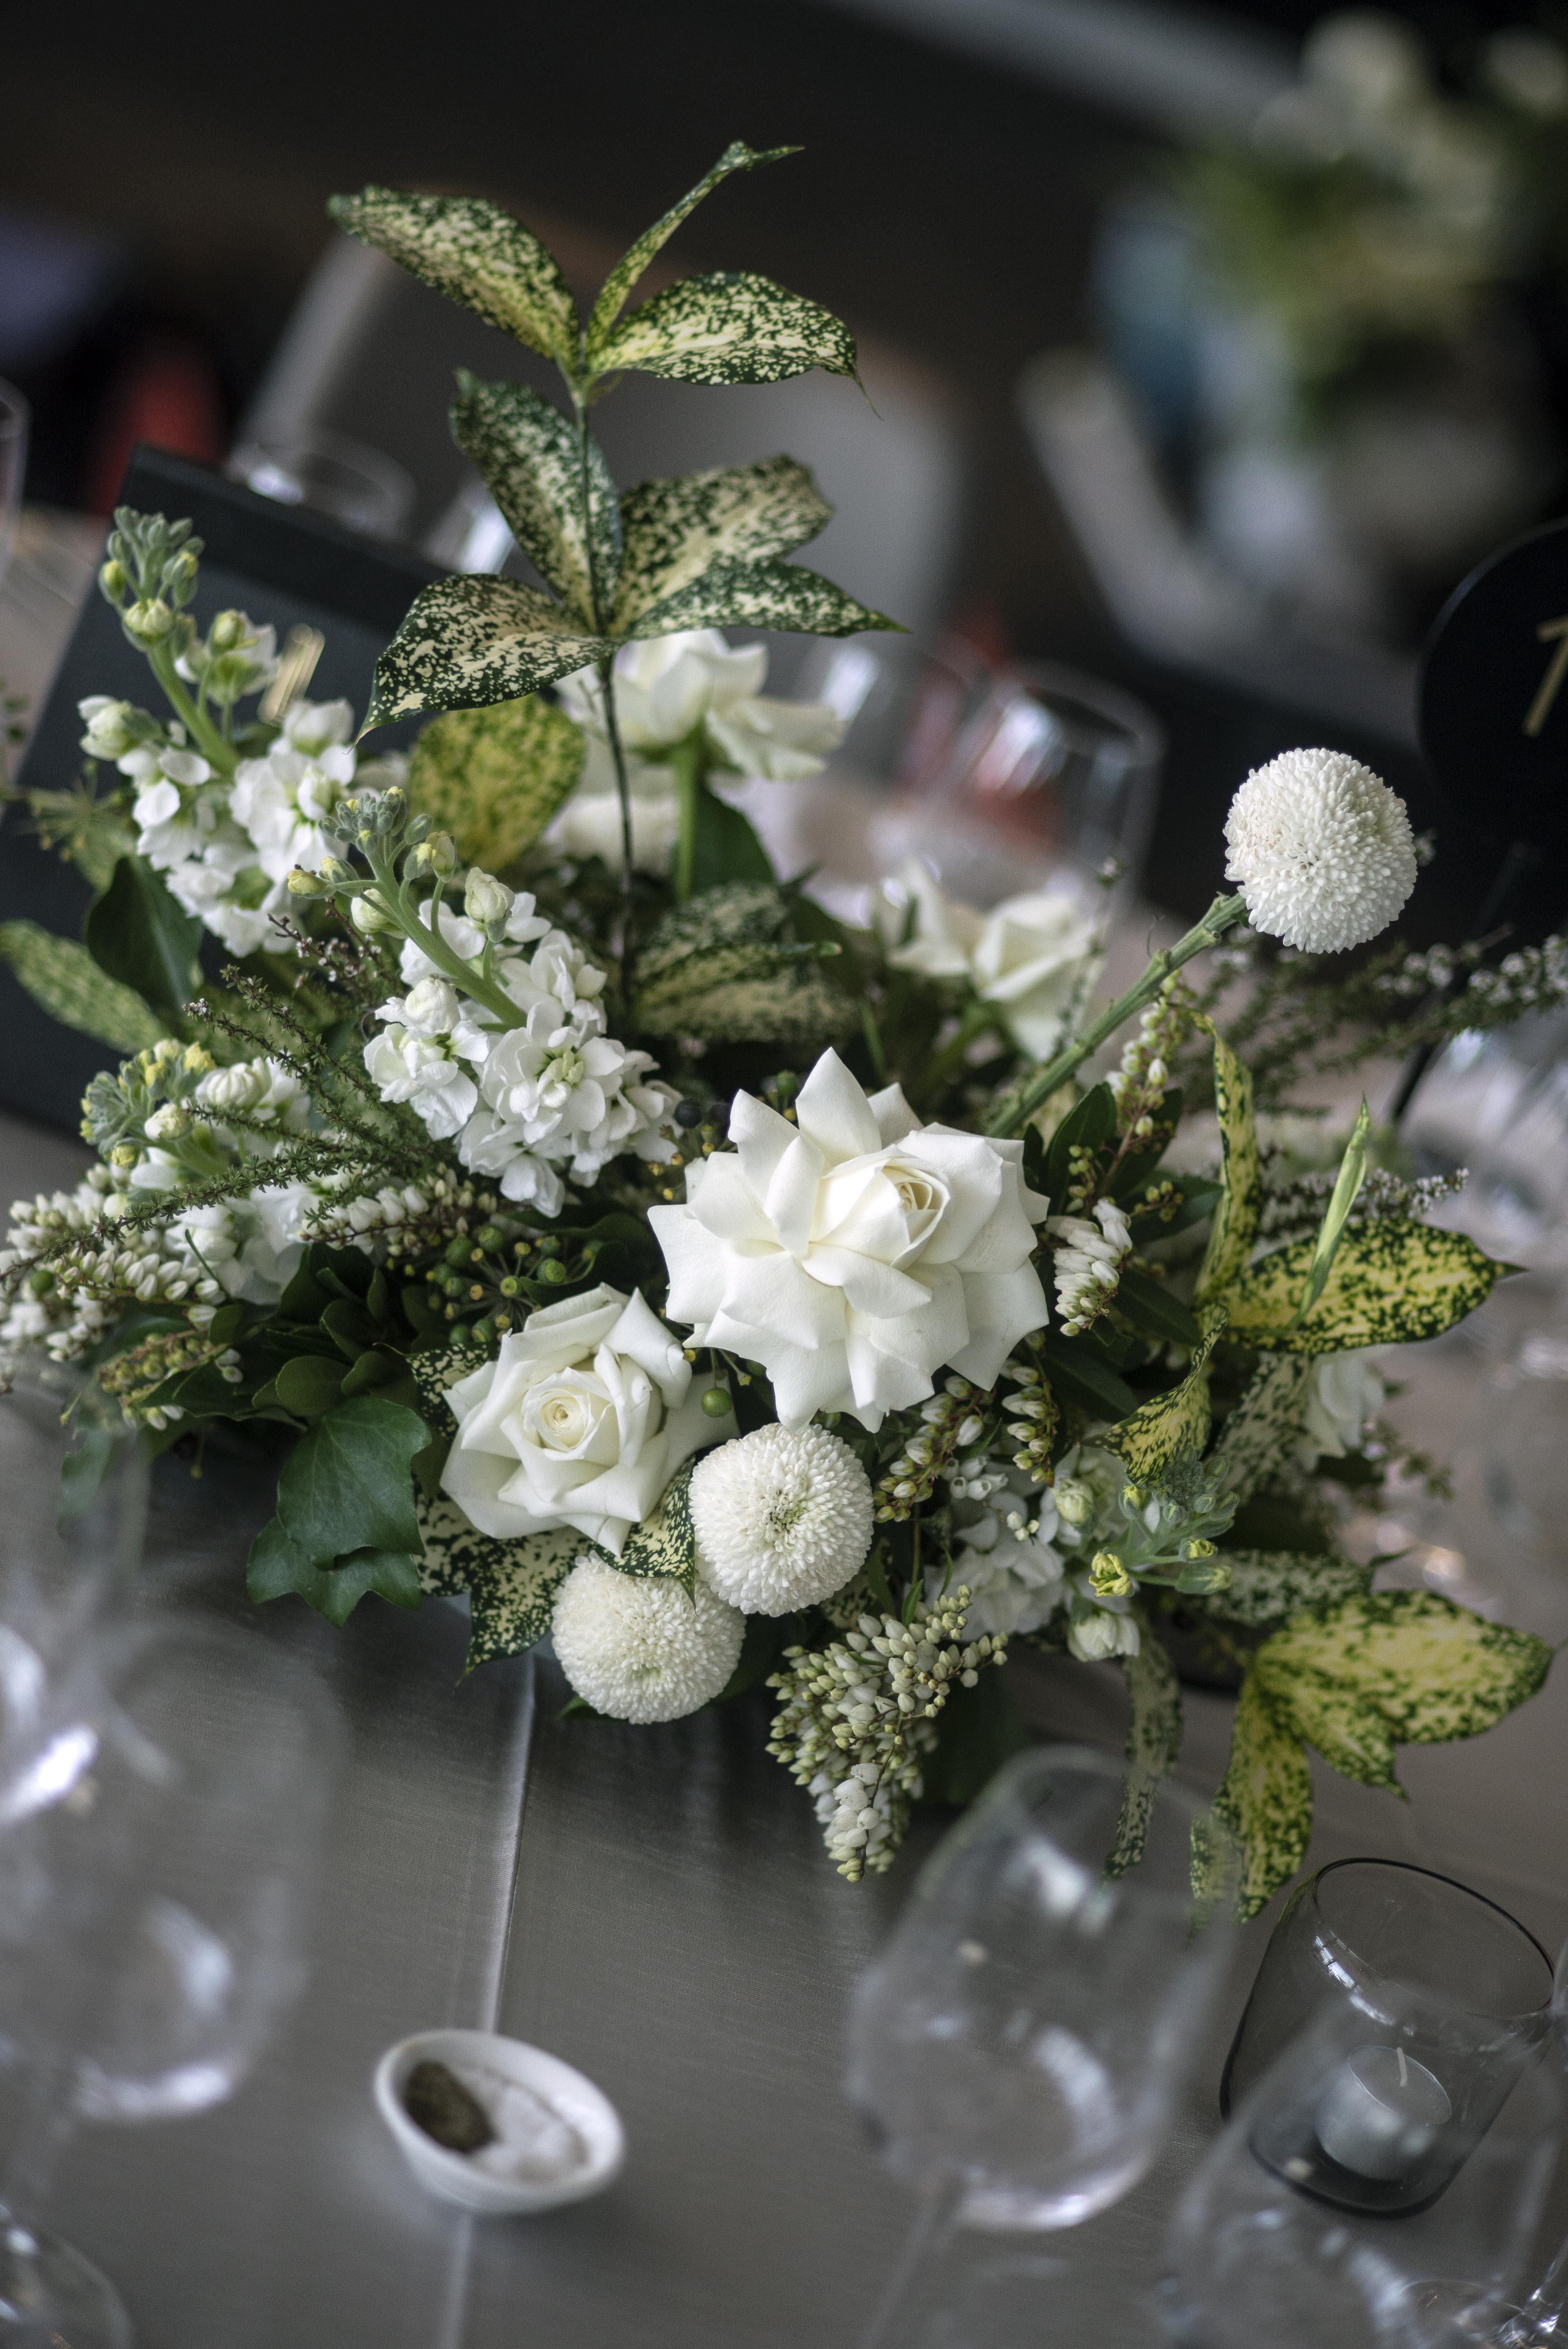 Green & white flower arrangement